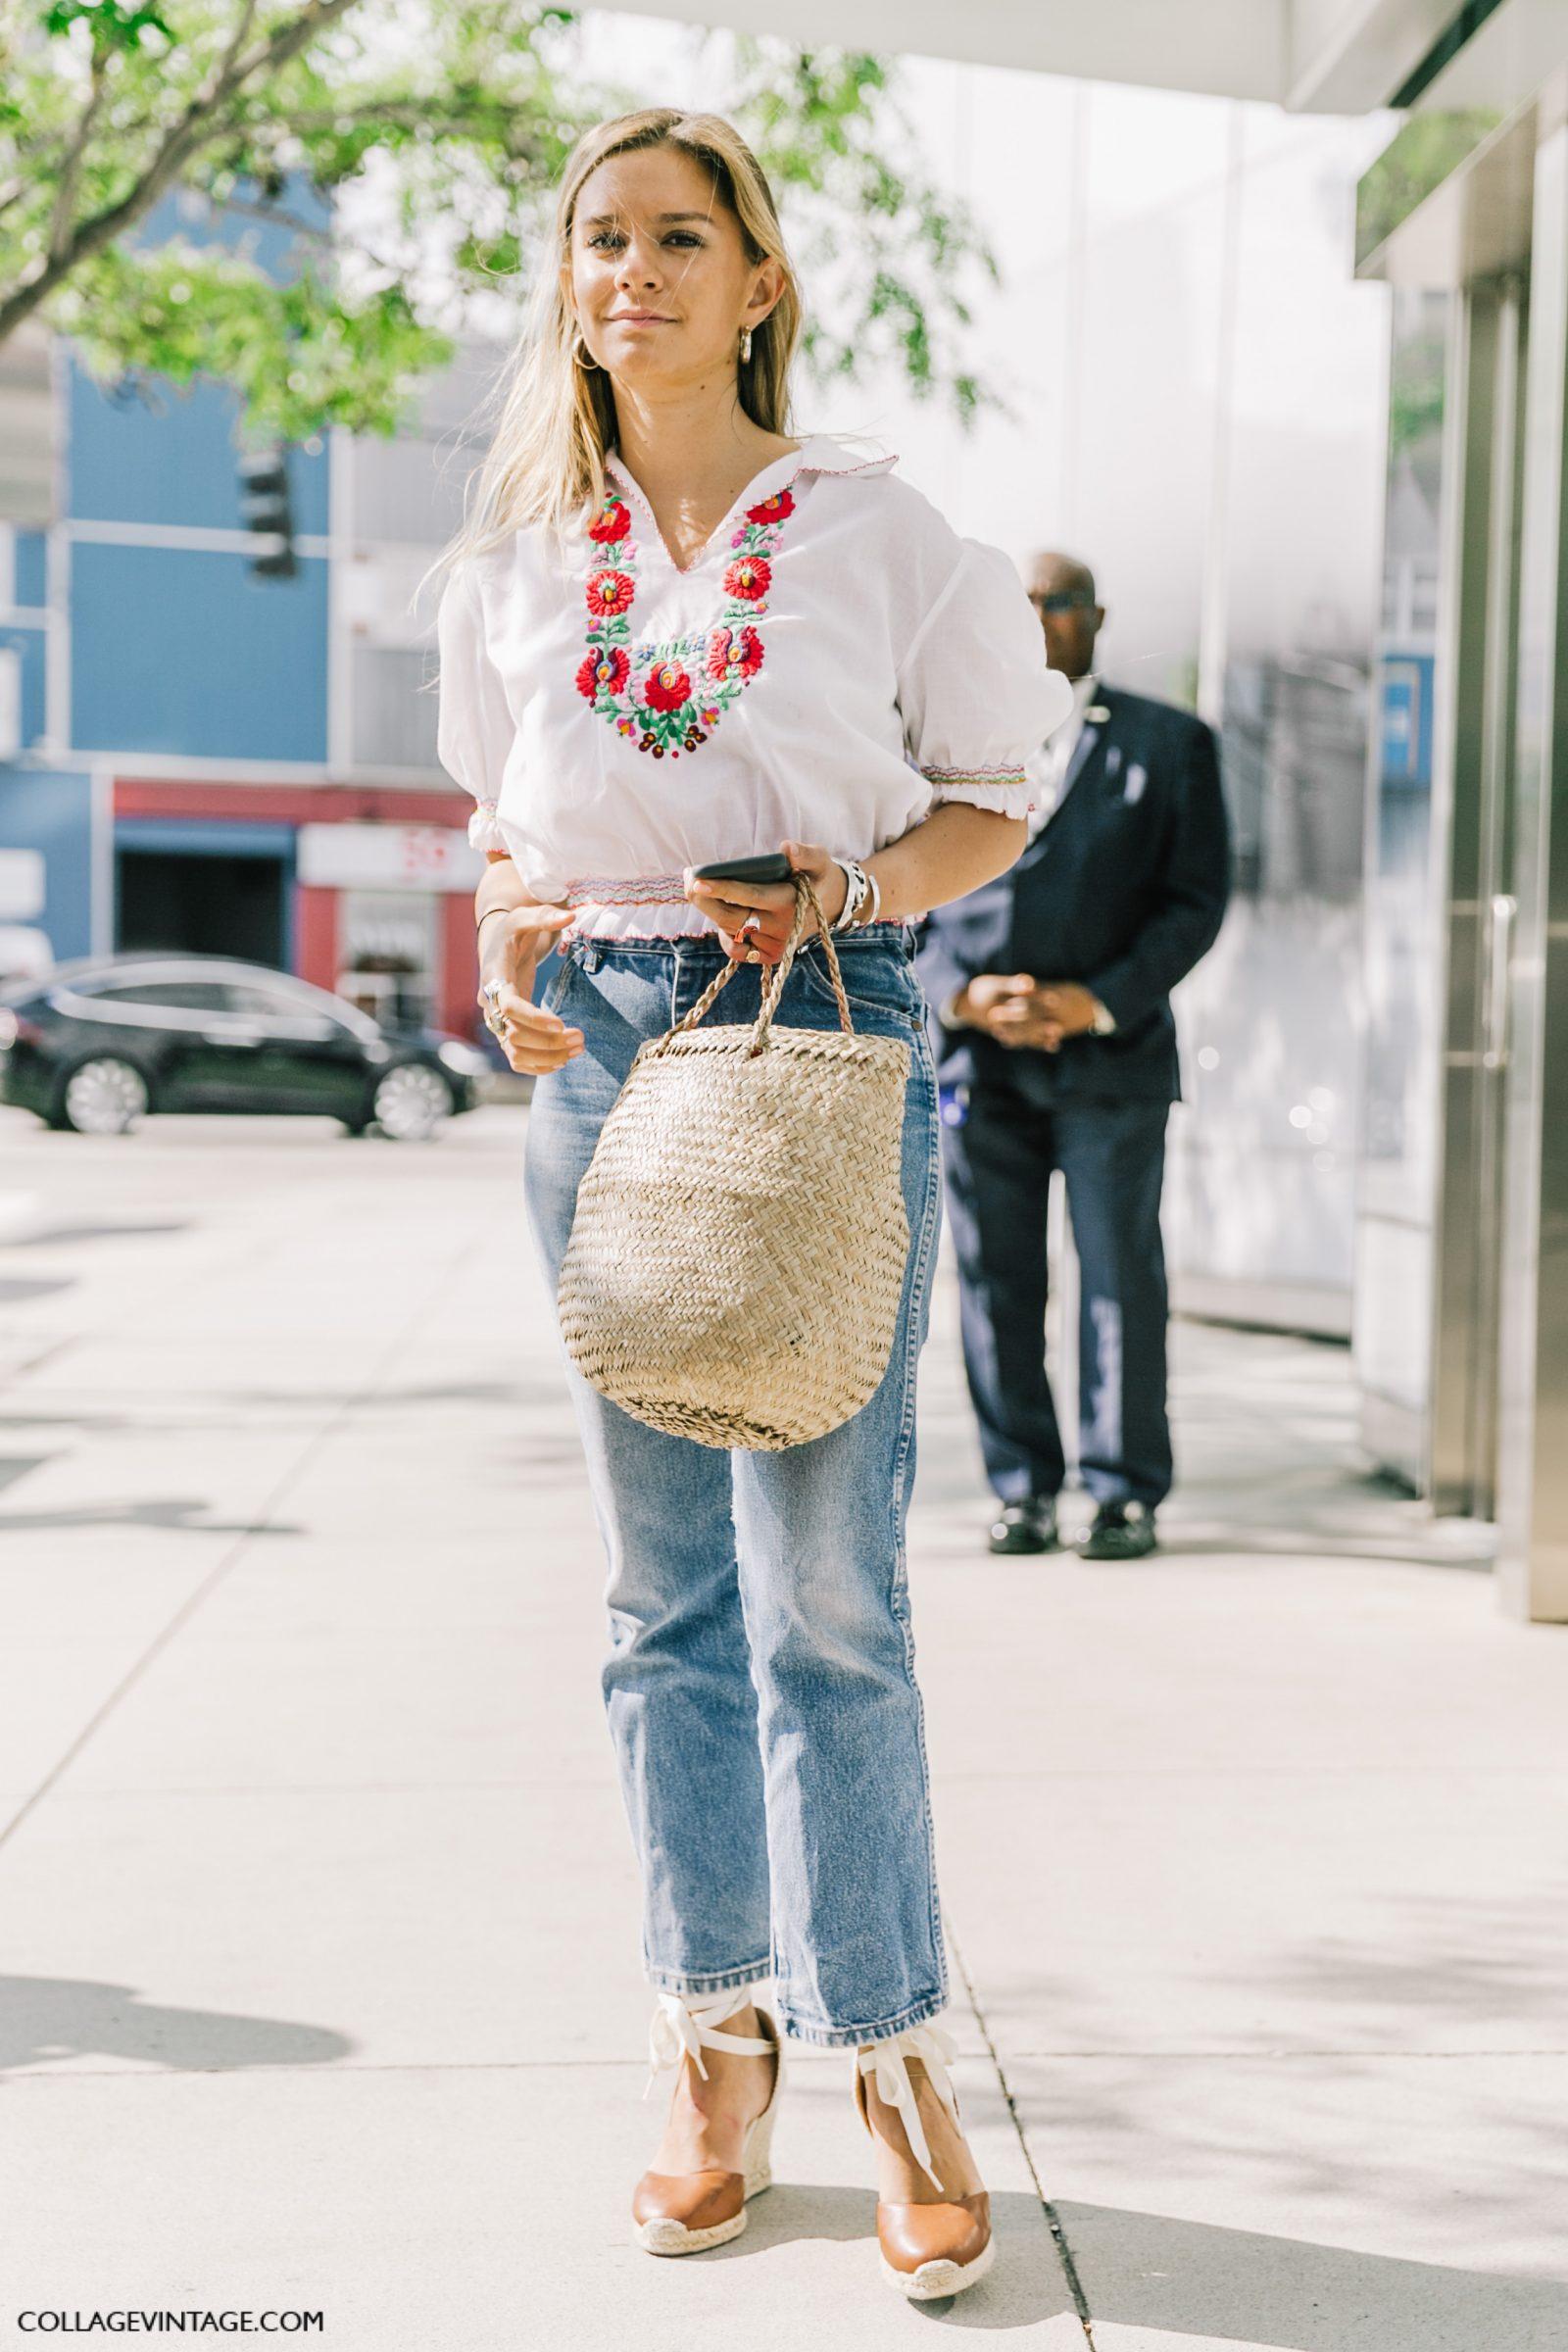 nyfw-new_york_fashion_week_ss17-street_style-outfits-collage_vintage-vintage-mansur_gavriel-rodarte-coach-128